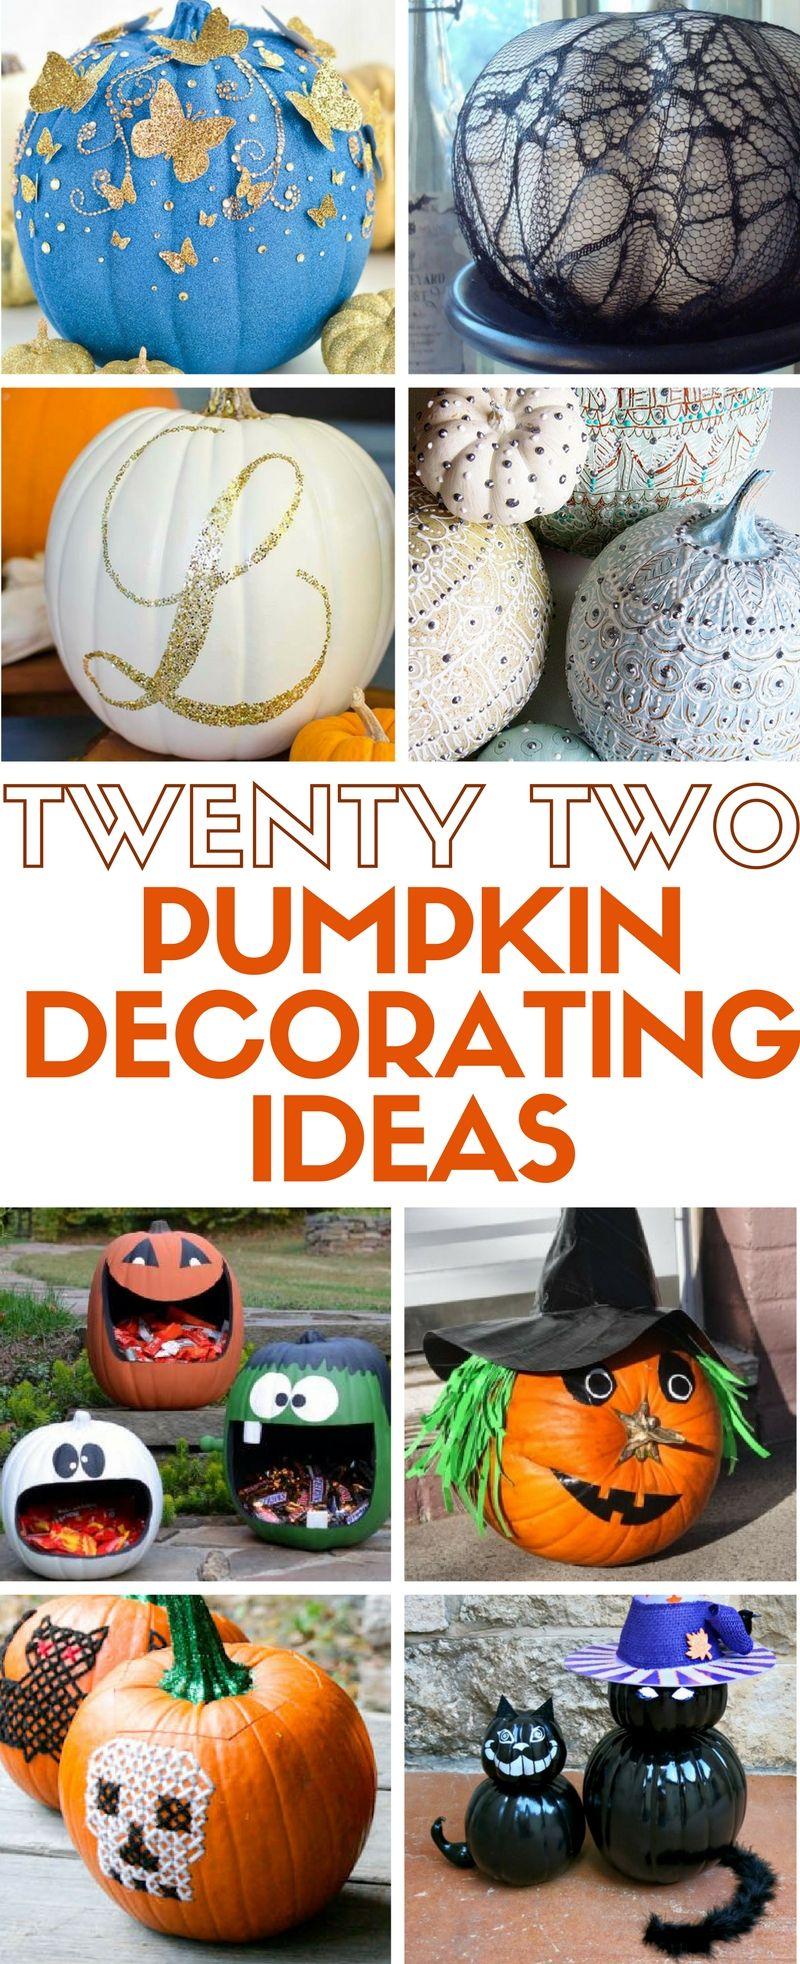 22 Pumpkin Decorating Ideas The Crafty